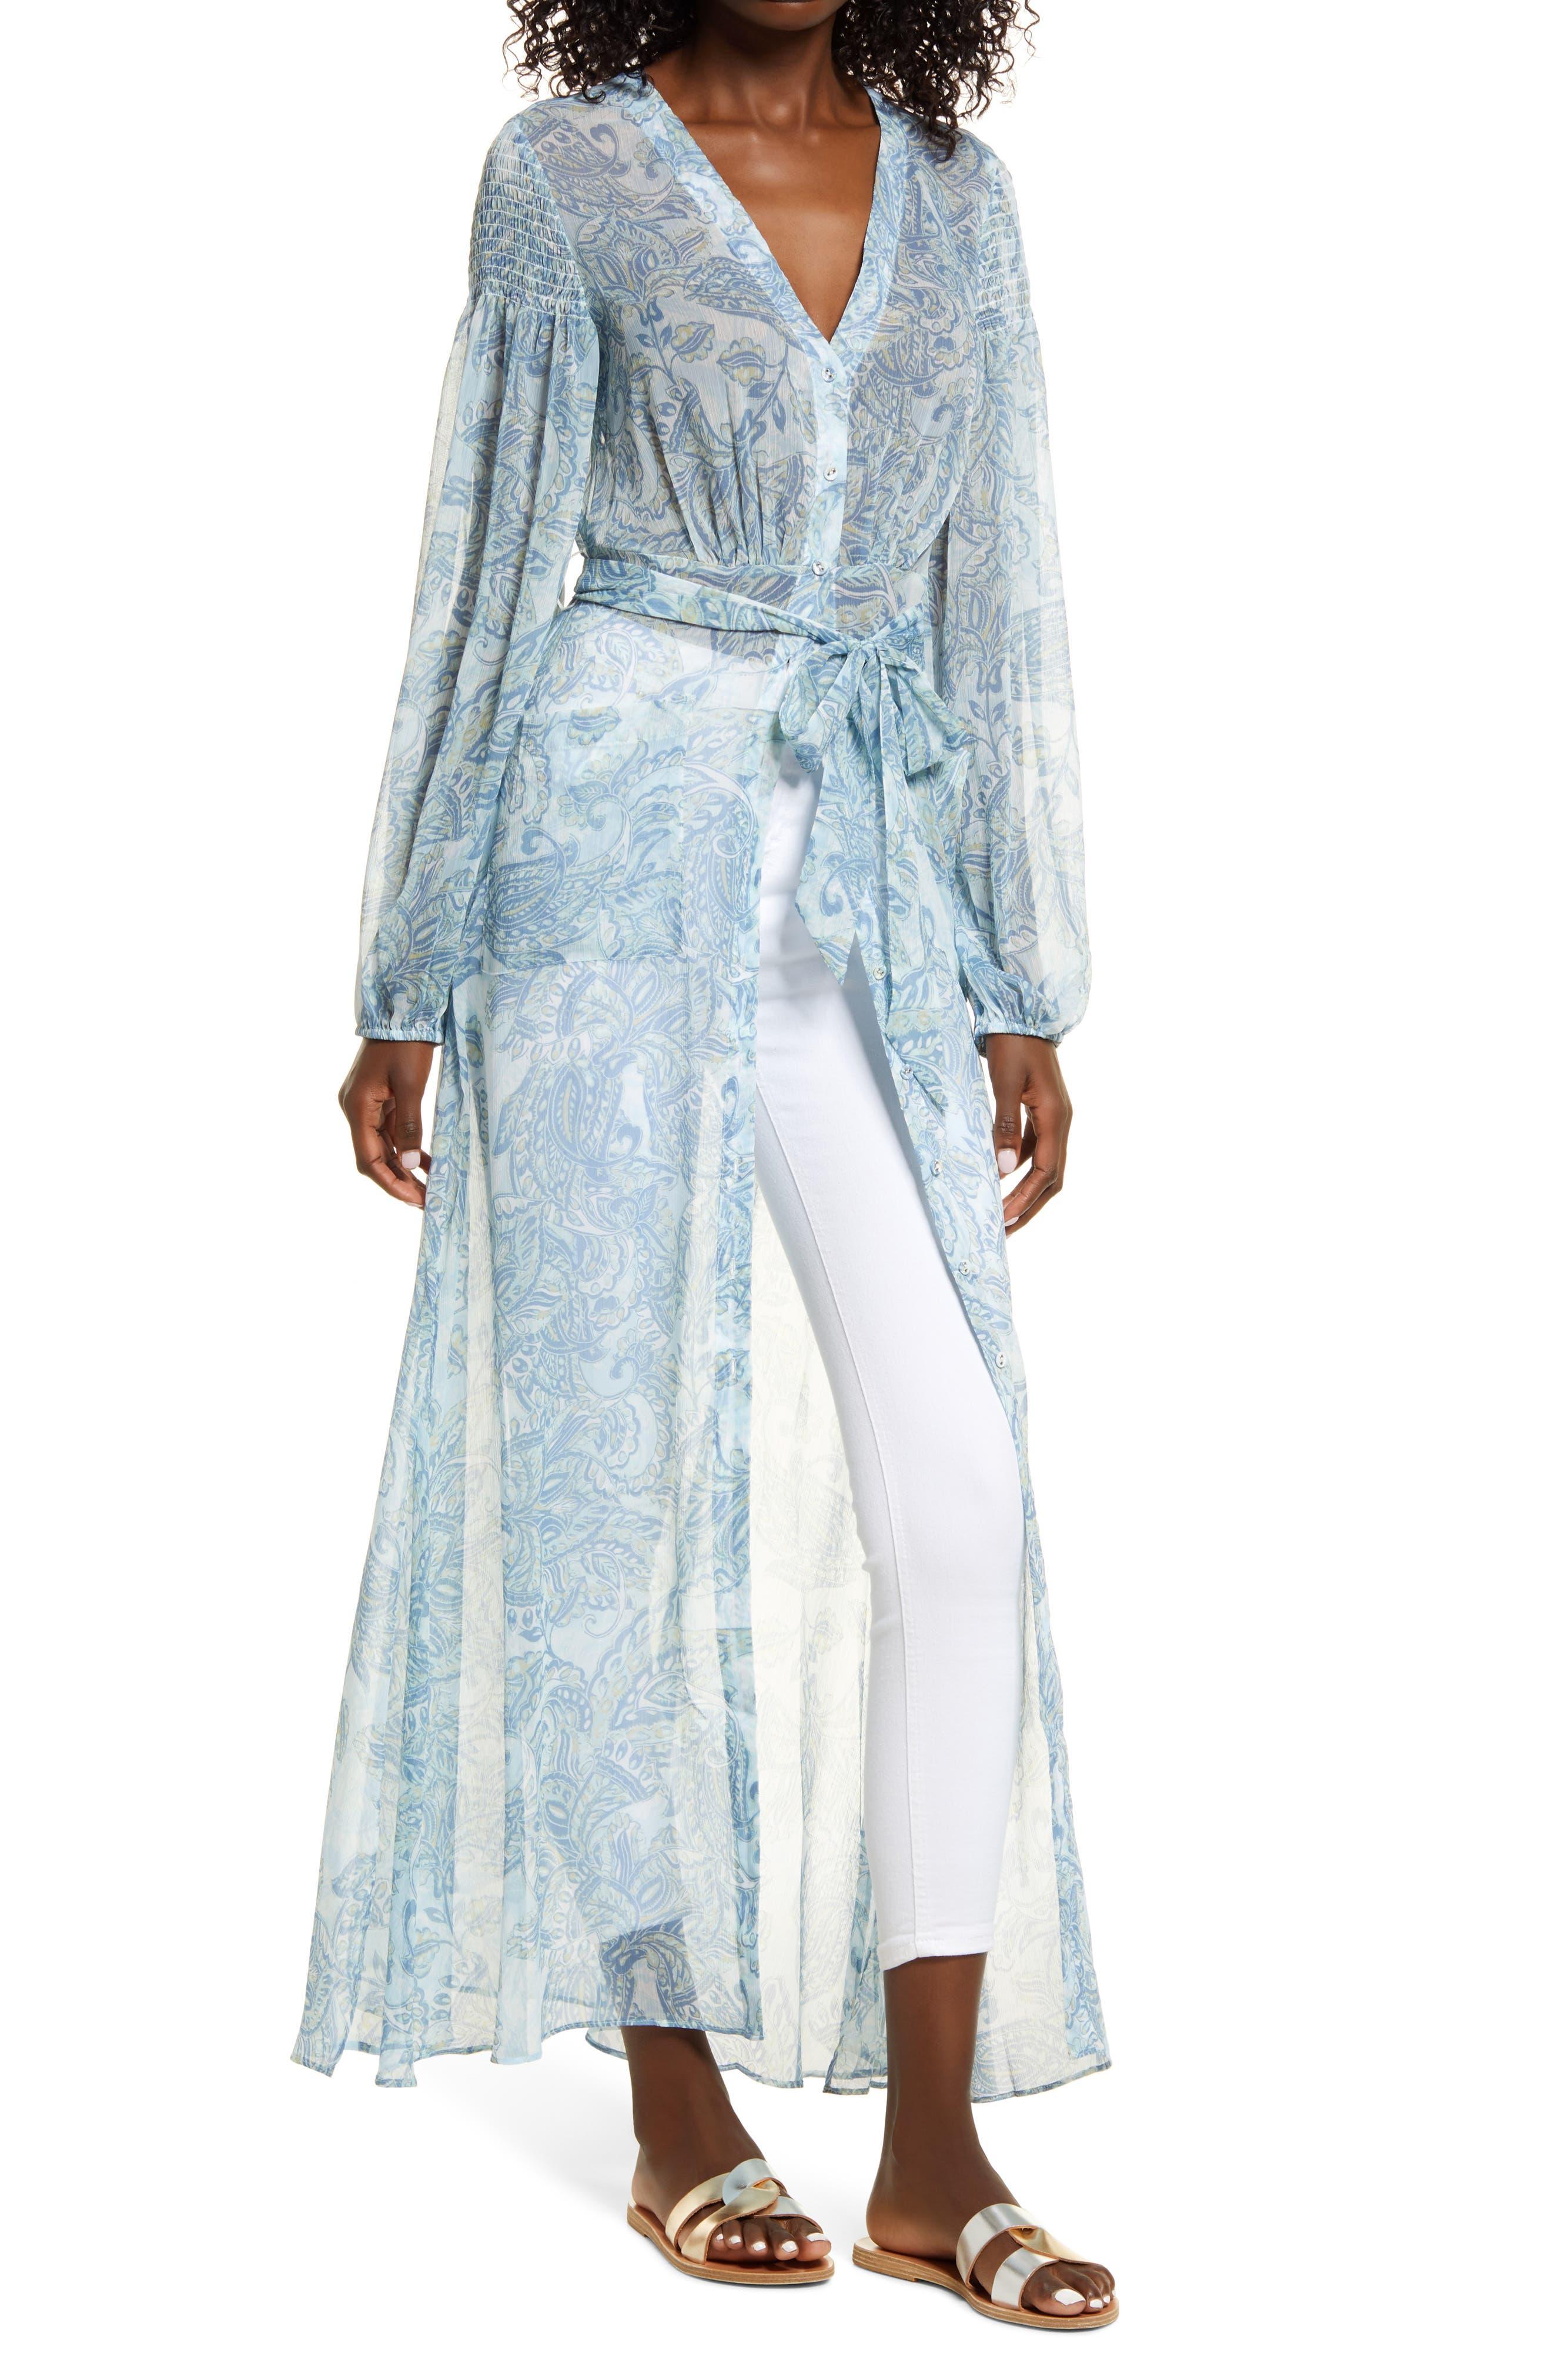 Bre Long Sleeve Maxi Dress